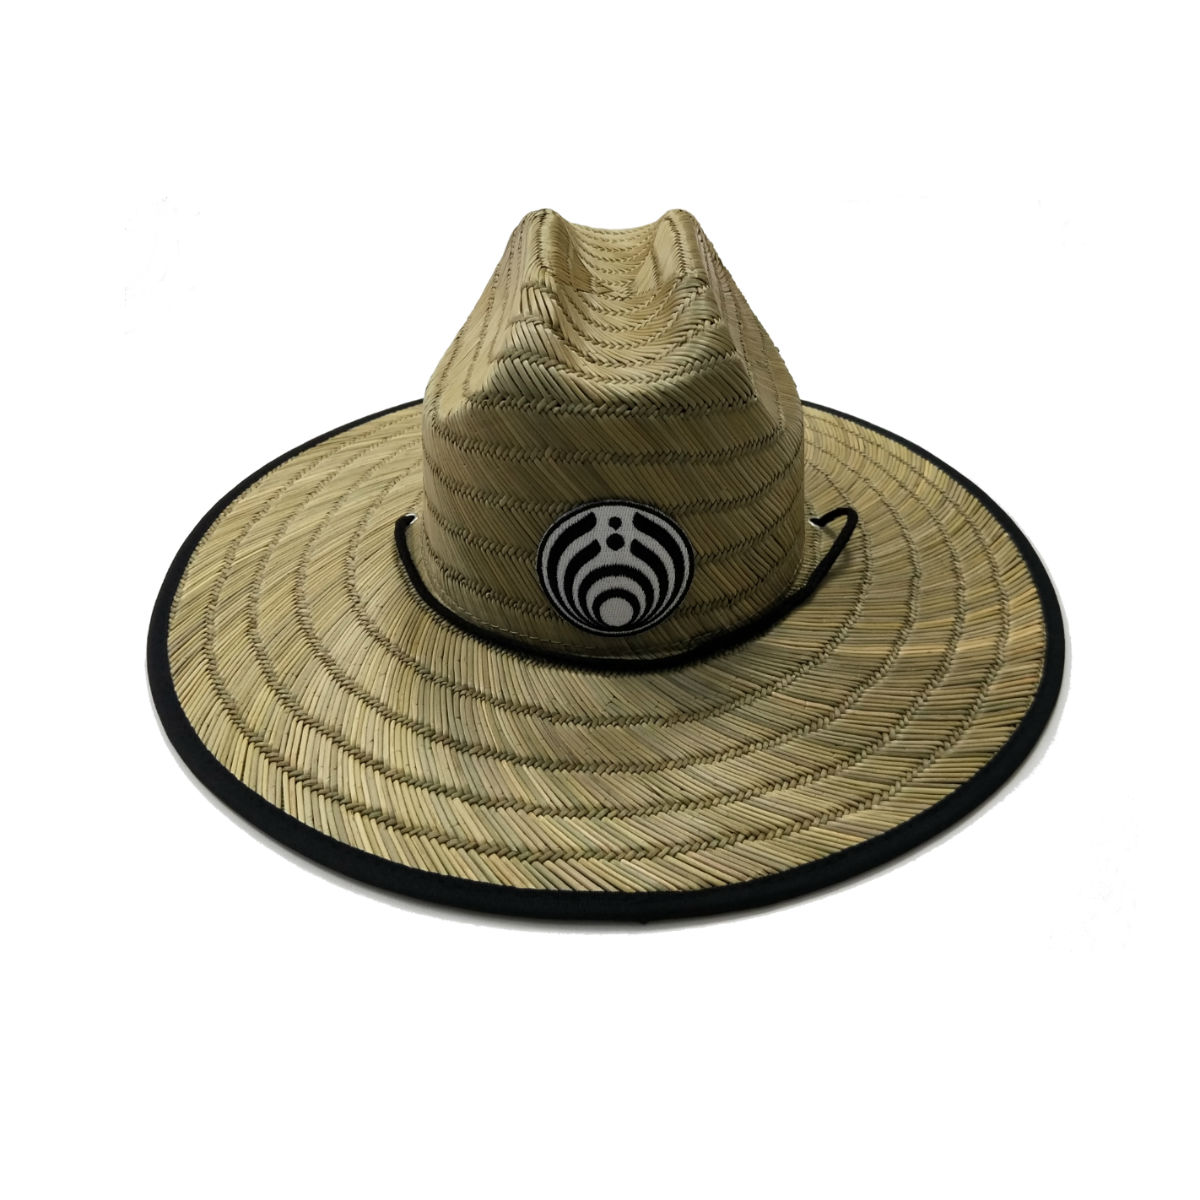 DejaVoom Mexico 2020 Event Lifeguard Hat